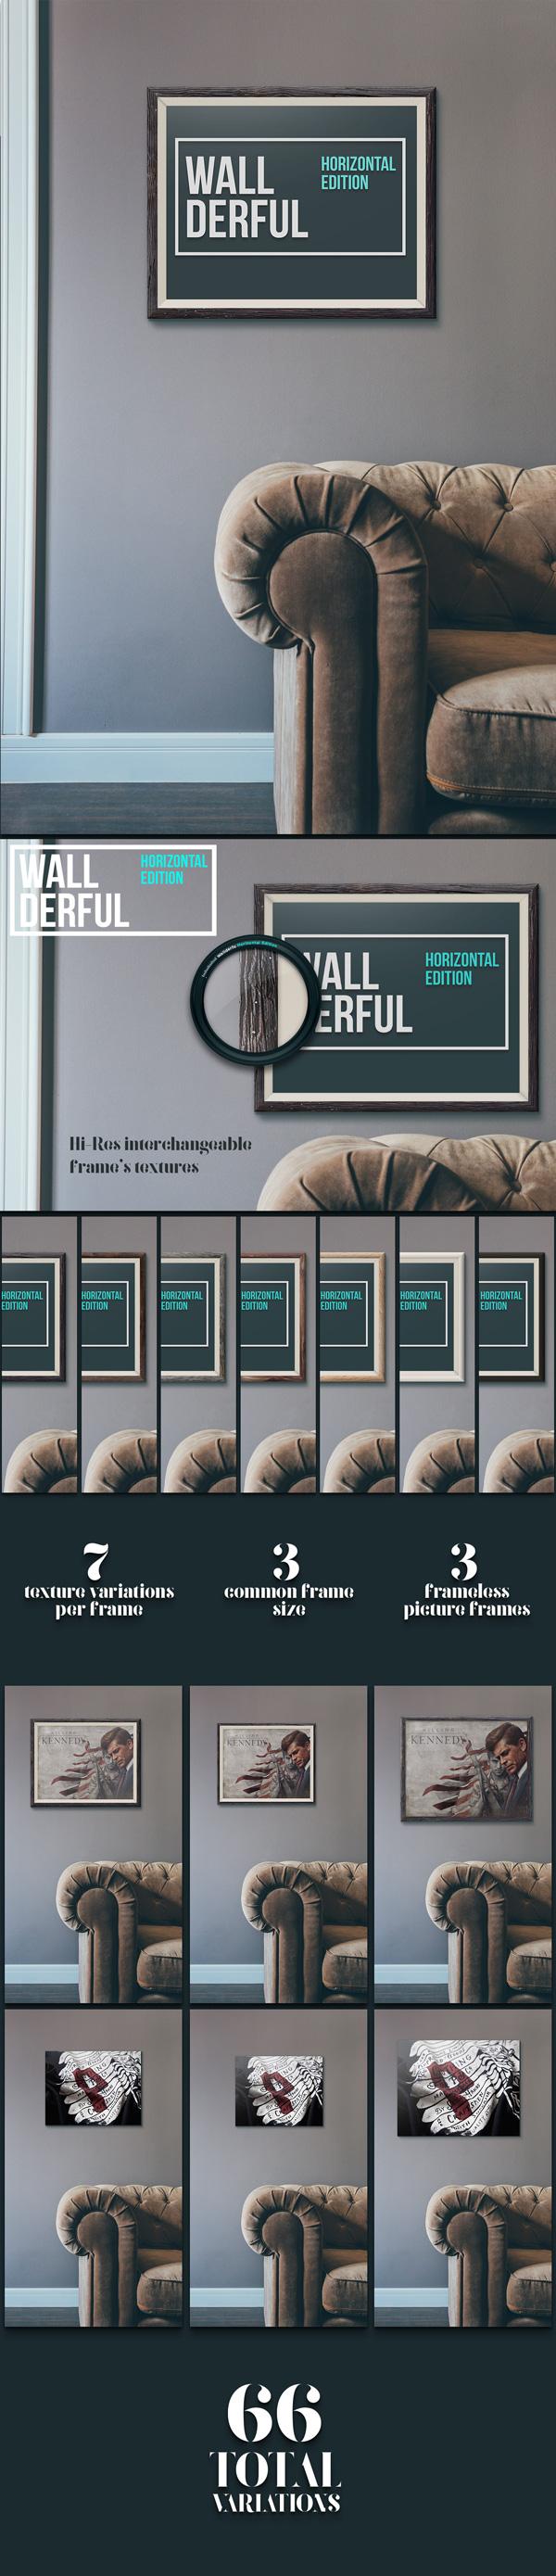 Wallderful: Horizontal Frames MockUps   GraphicBurger